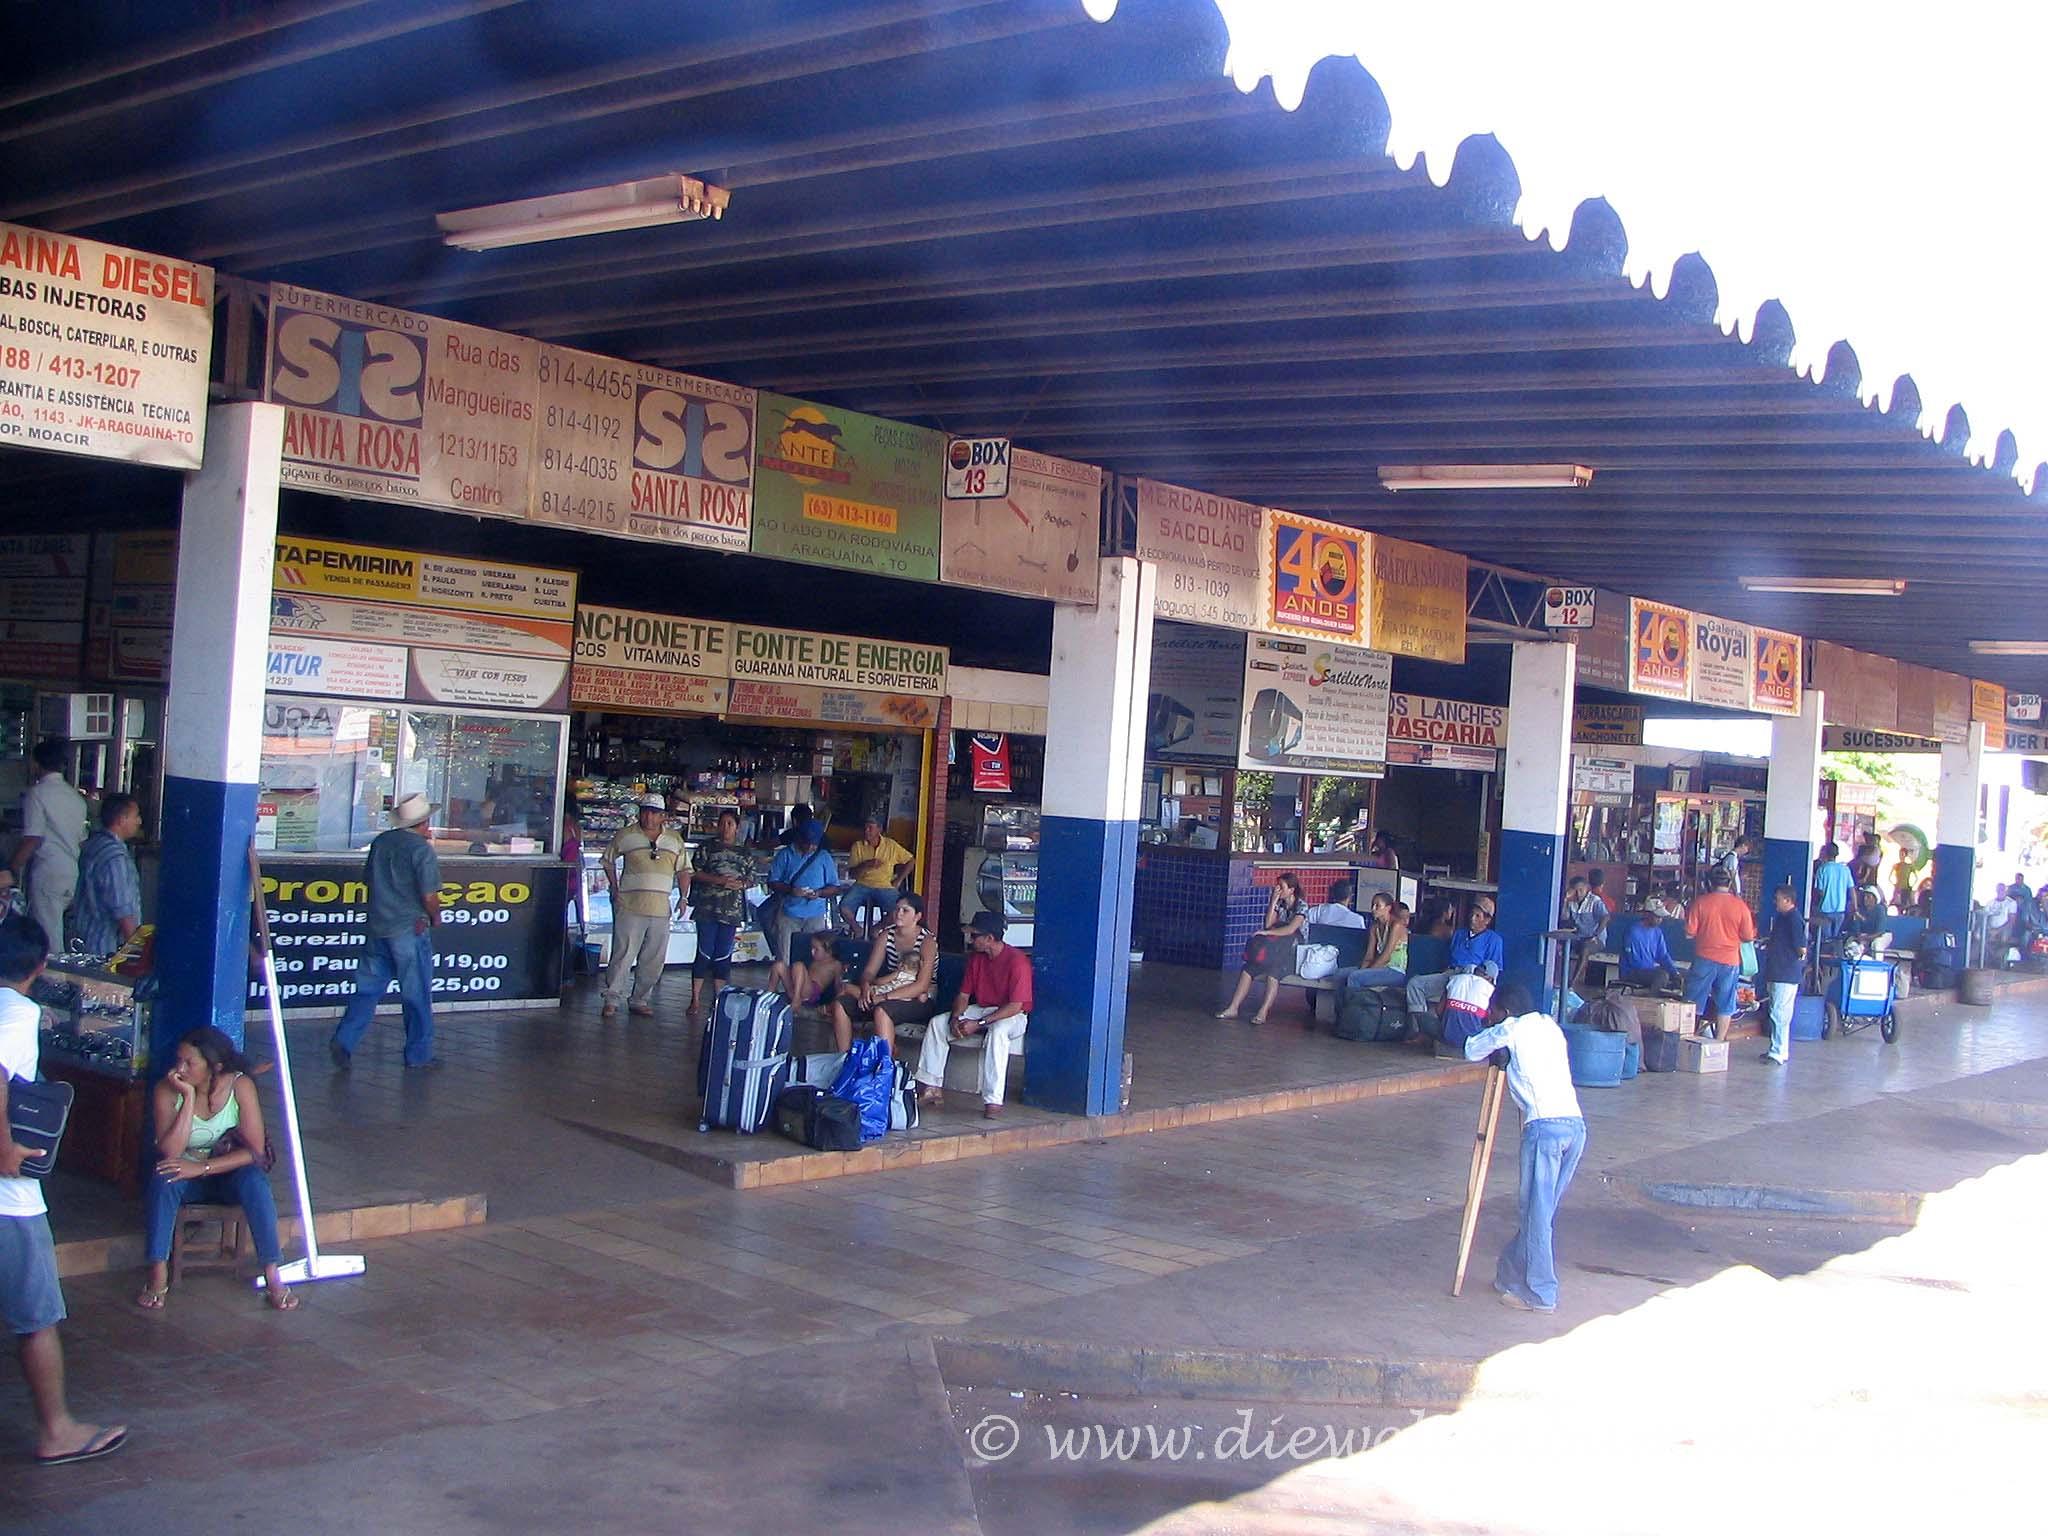 Brasilianischer Busbahnhof